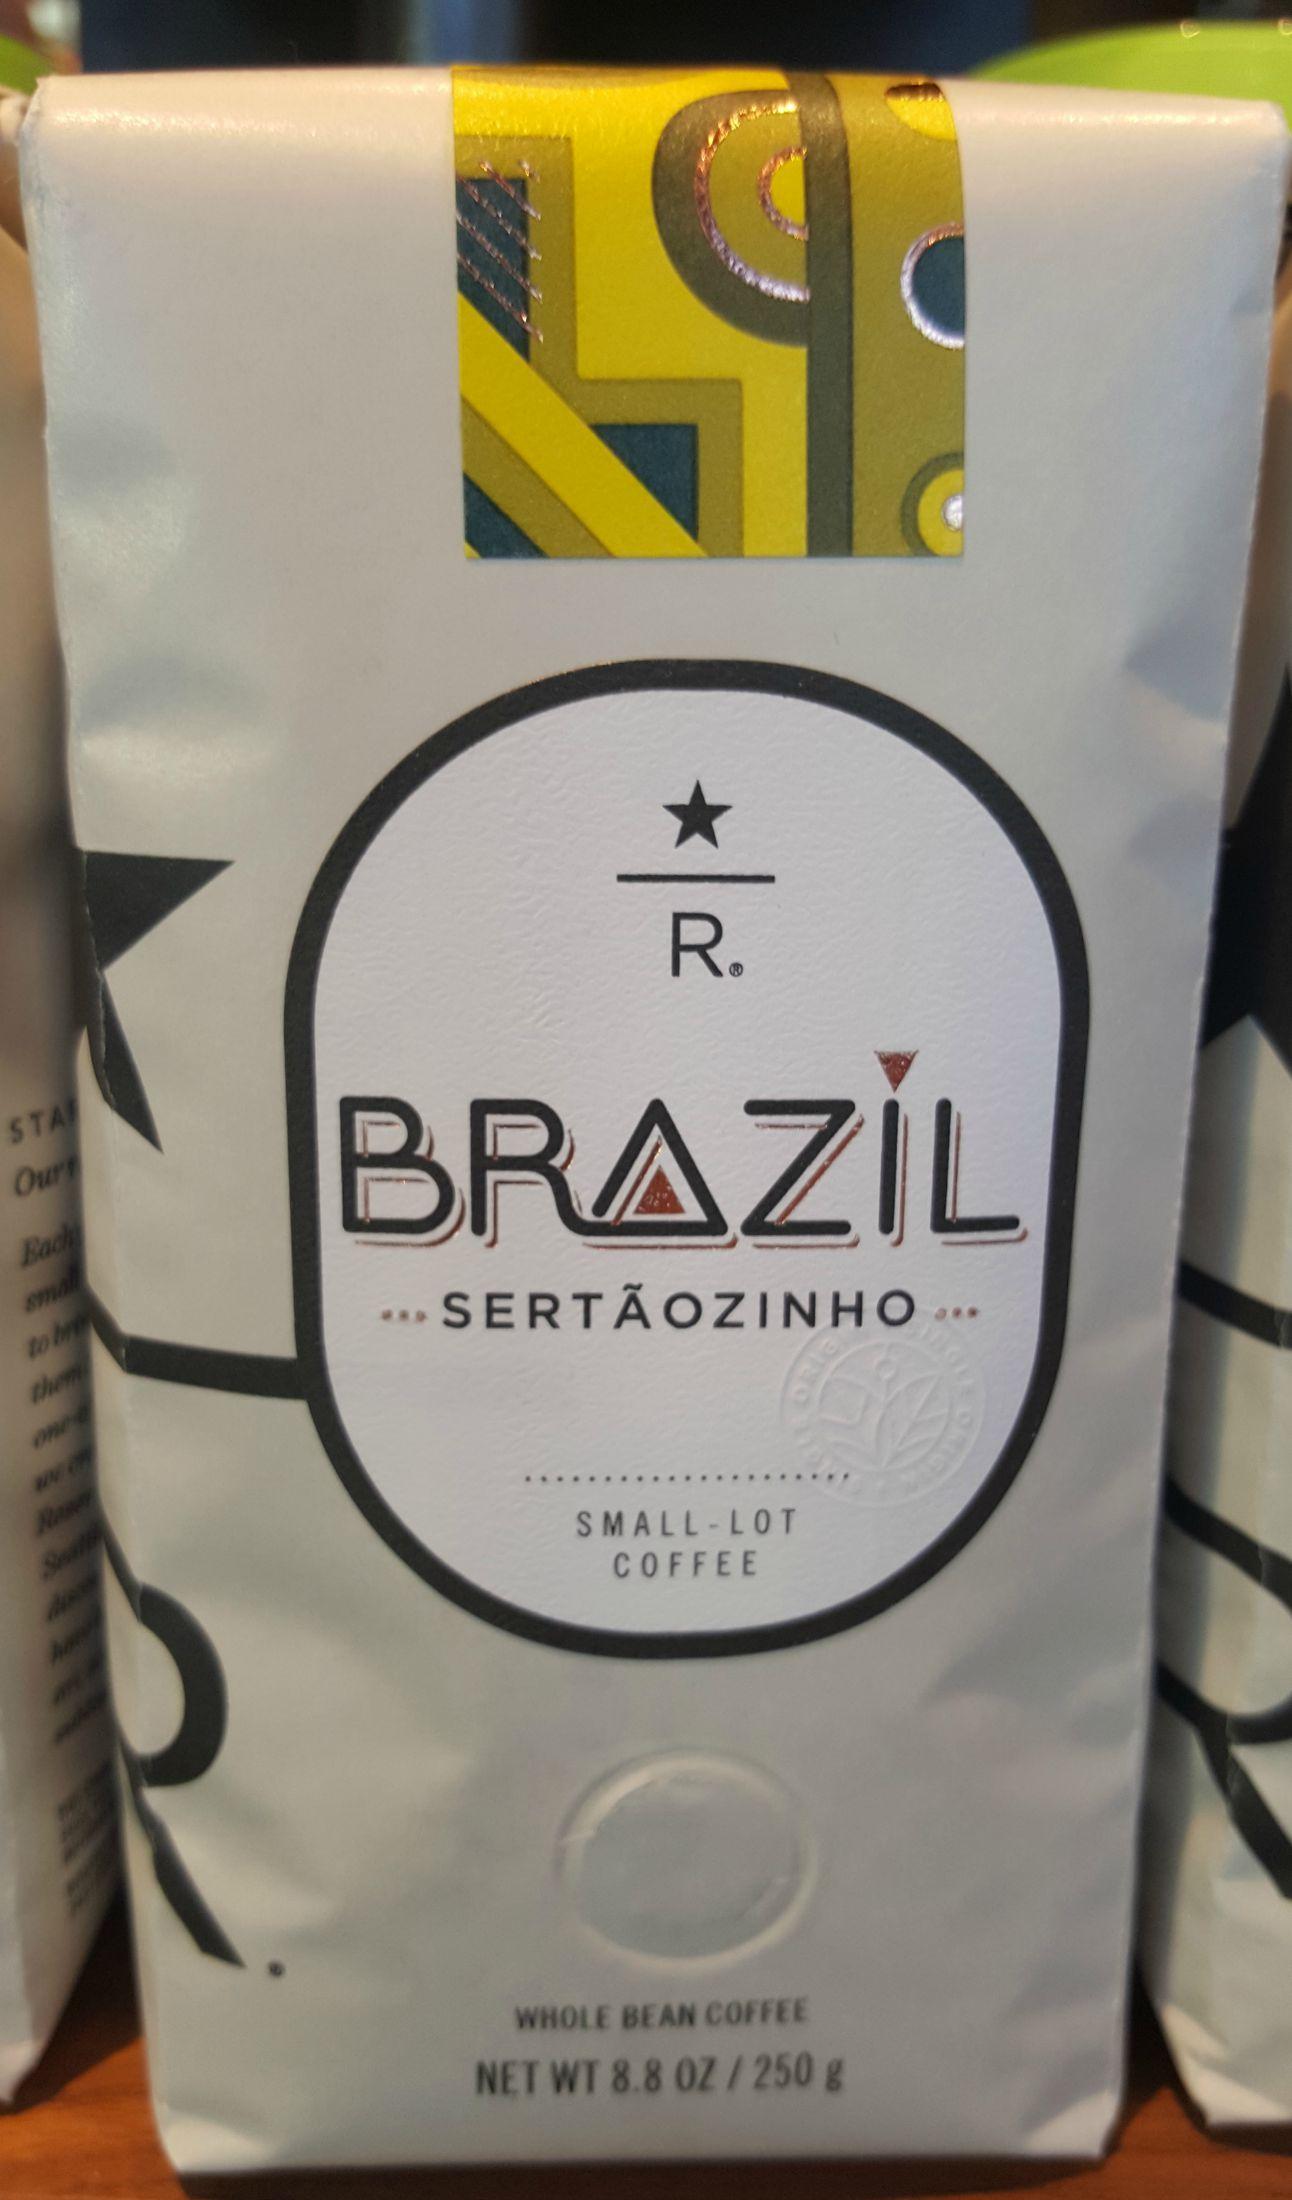 1 - 1 - 20150605_194950 Coffee Brazil Sertaozinho.jpg